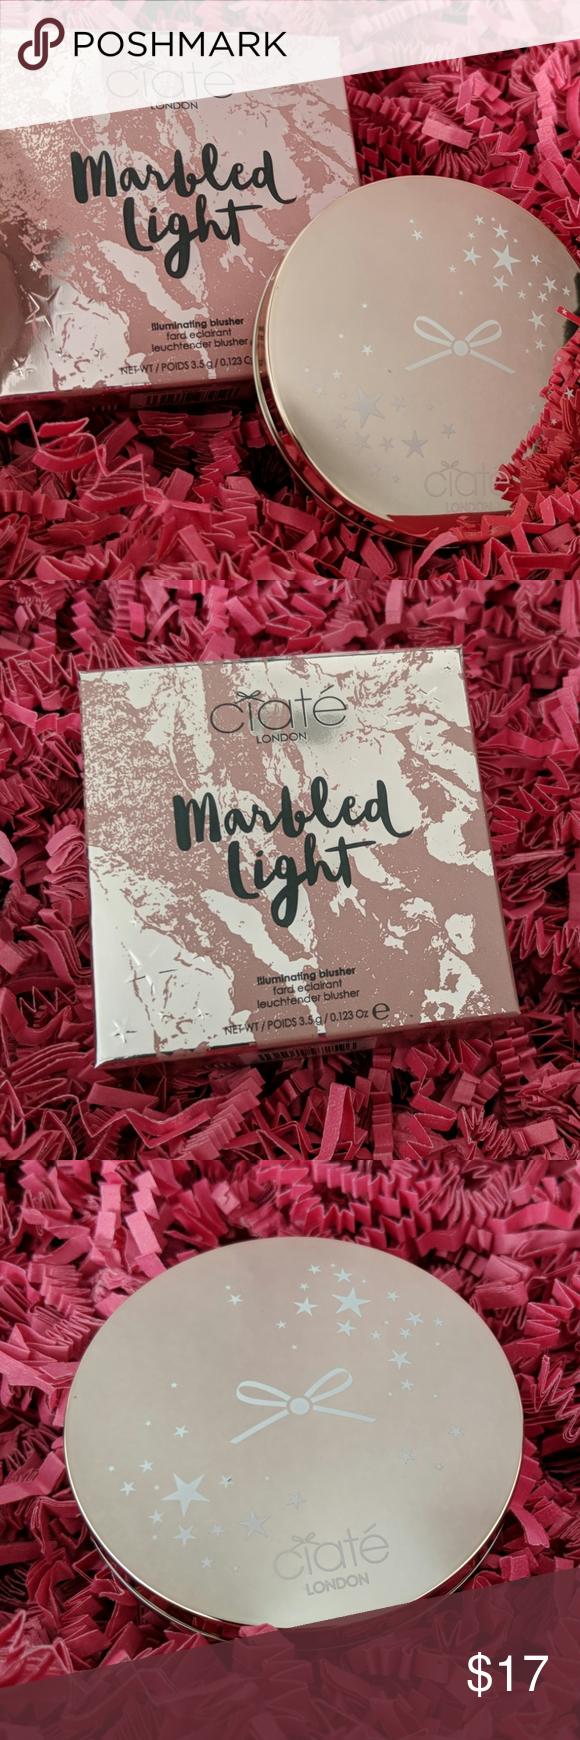 Ciaté Marbled Light Illuminating Blush • Halo in 2020